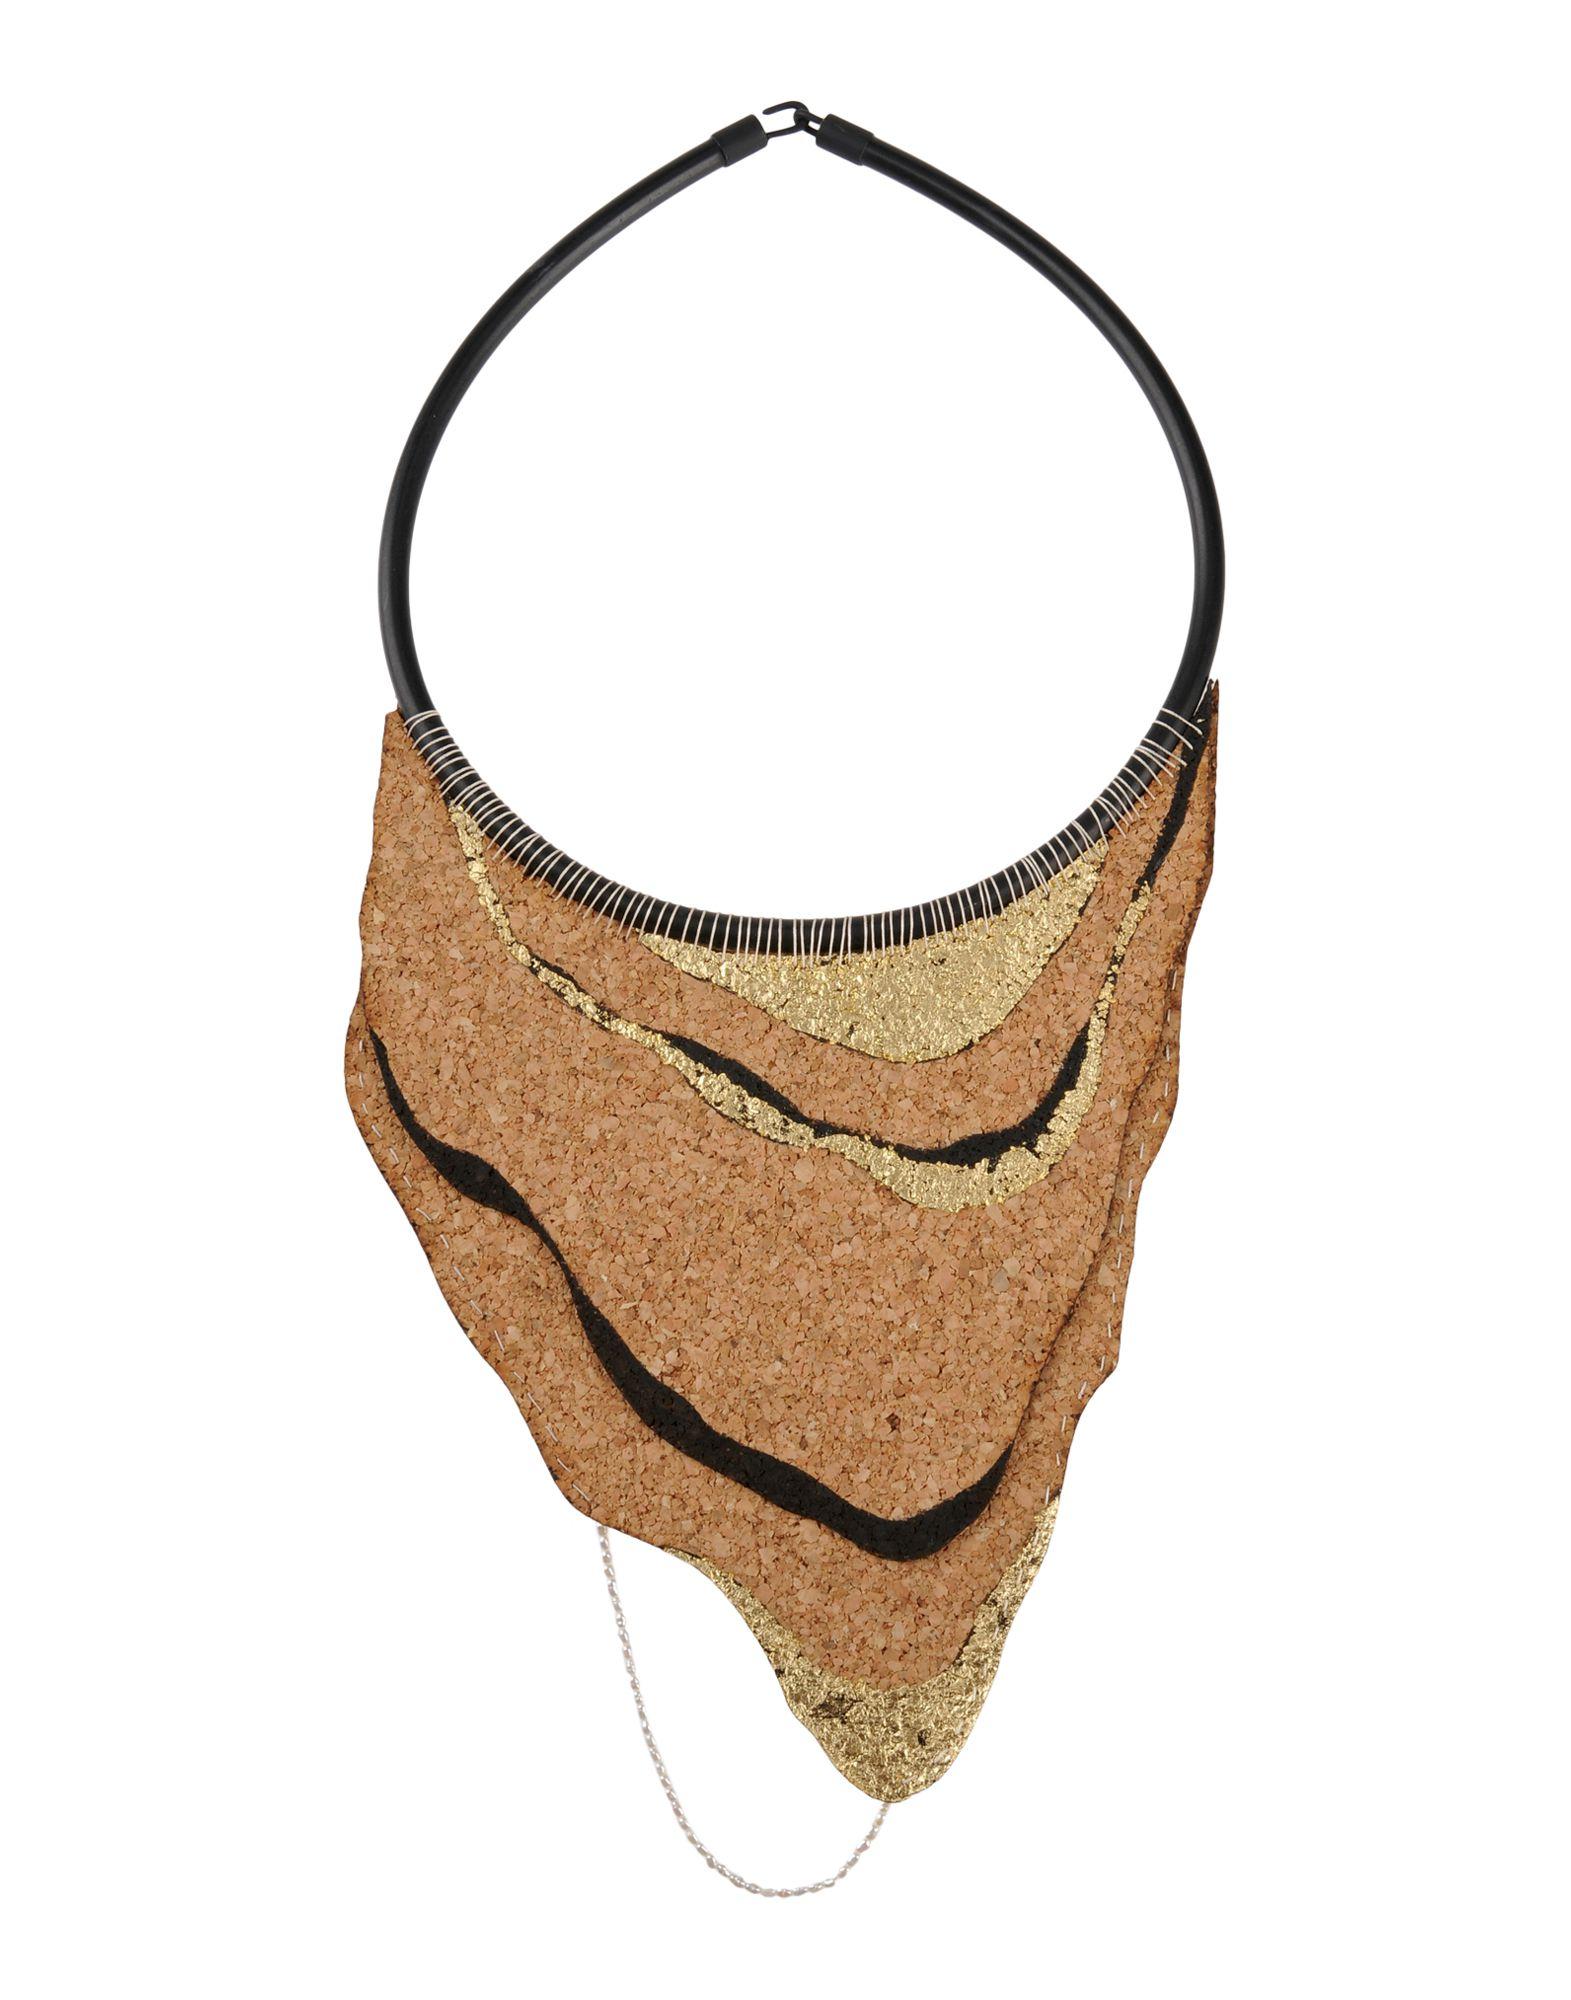 Collana First People First Geo Statement Necklace - Donna - Acquista online su